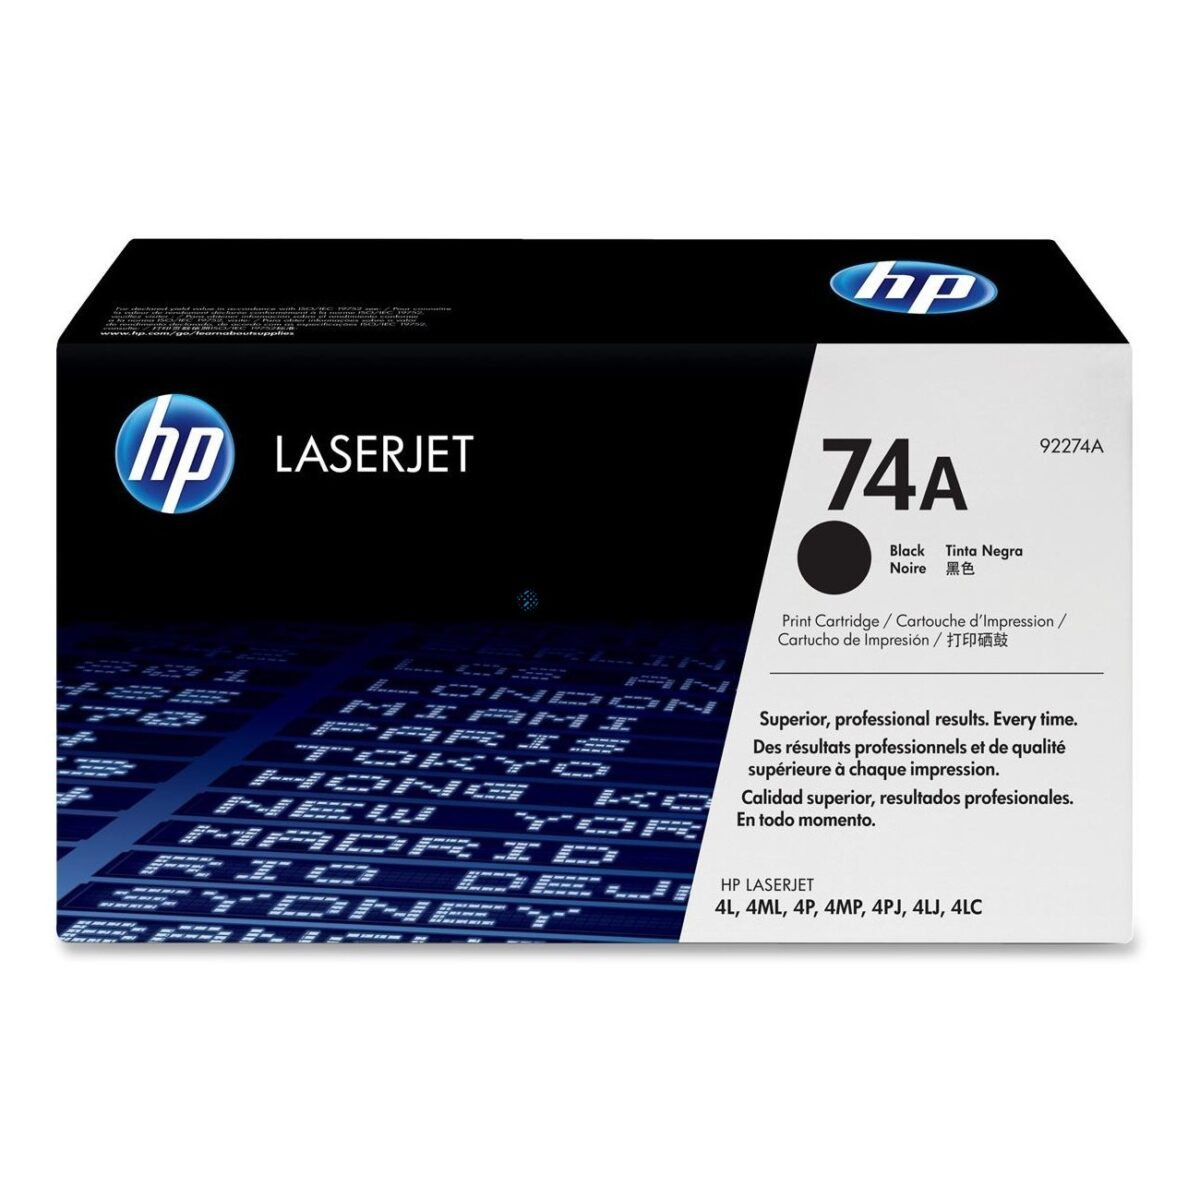 Картридж HP LaserJet 74A - - Tonerpatrone (92274A)